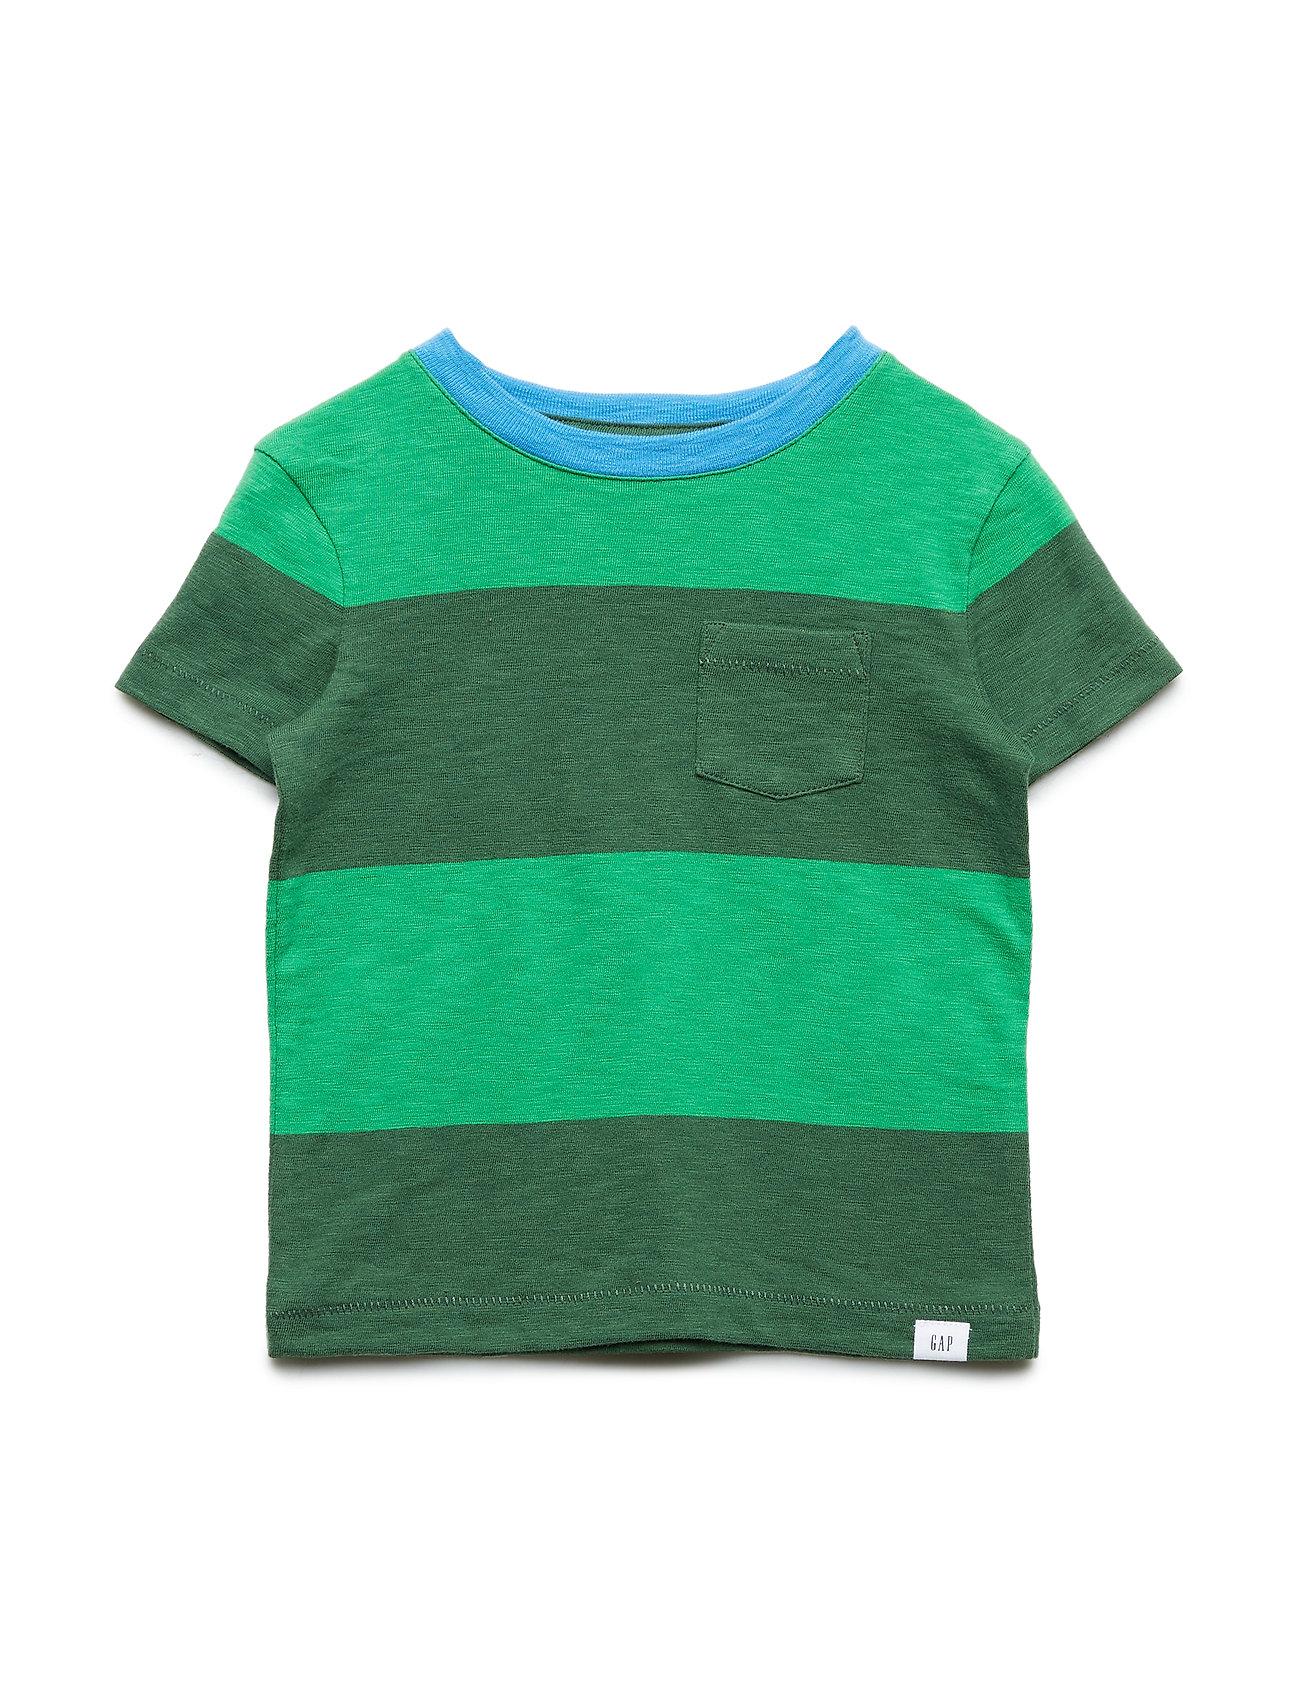 GAP Toddler Stripe Short Sleeve T-Shirt - GREEN GABLES